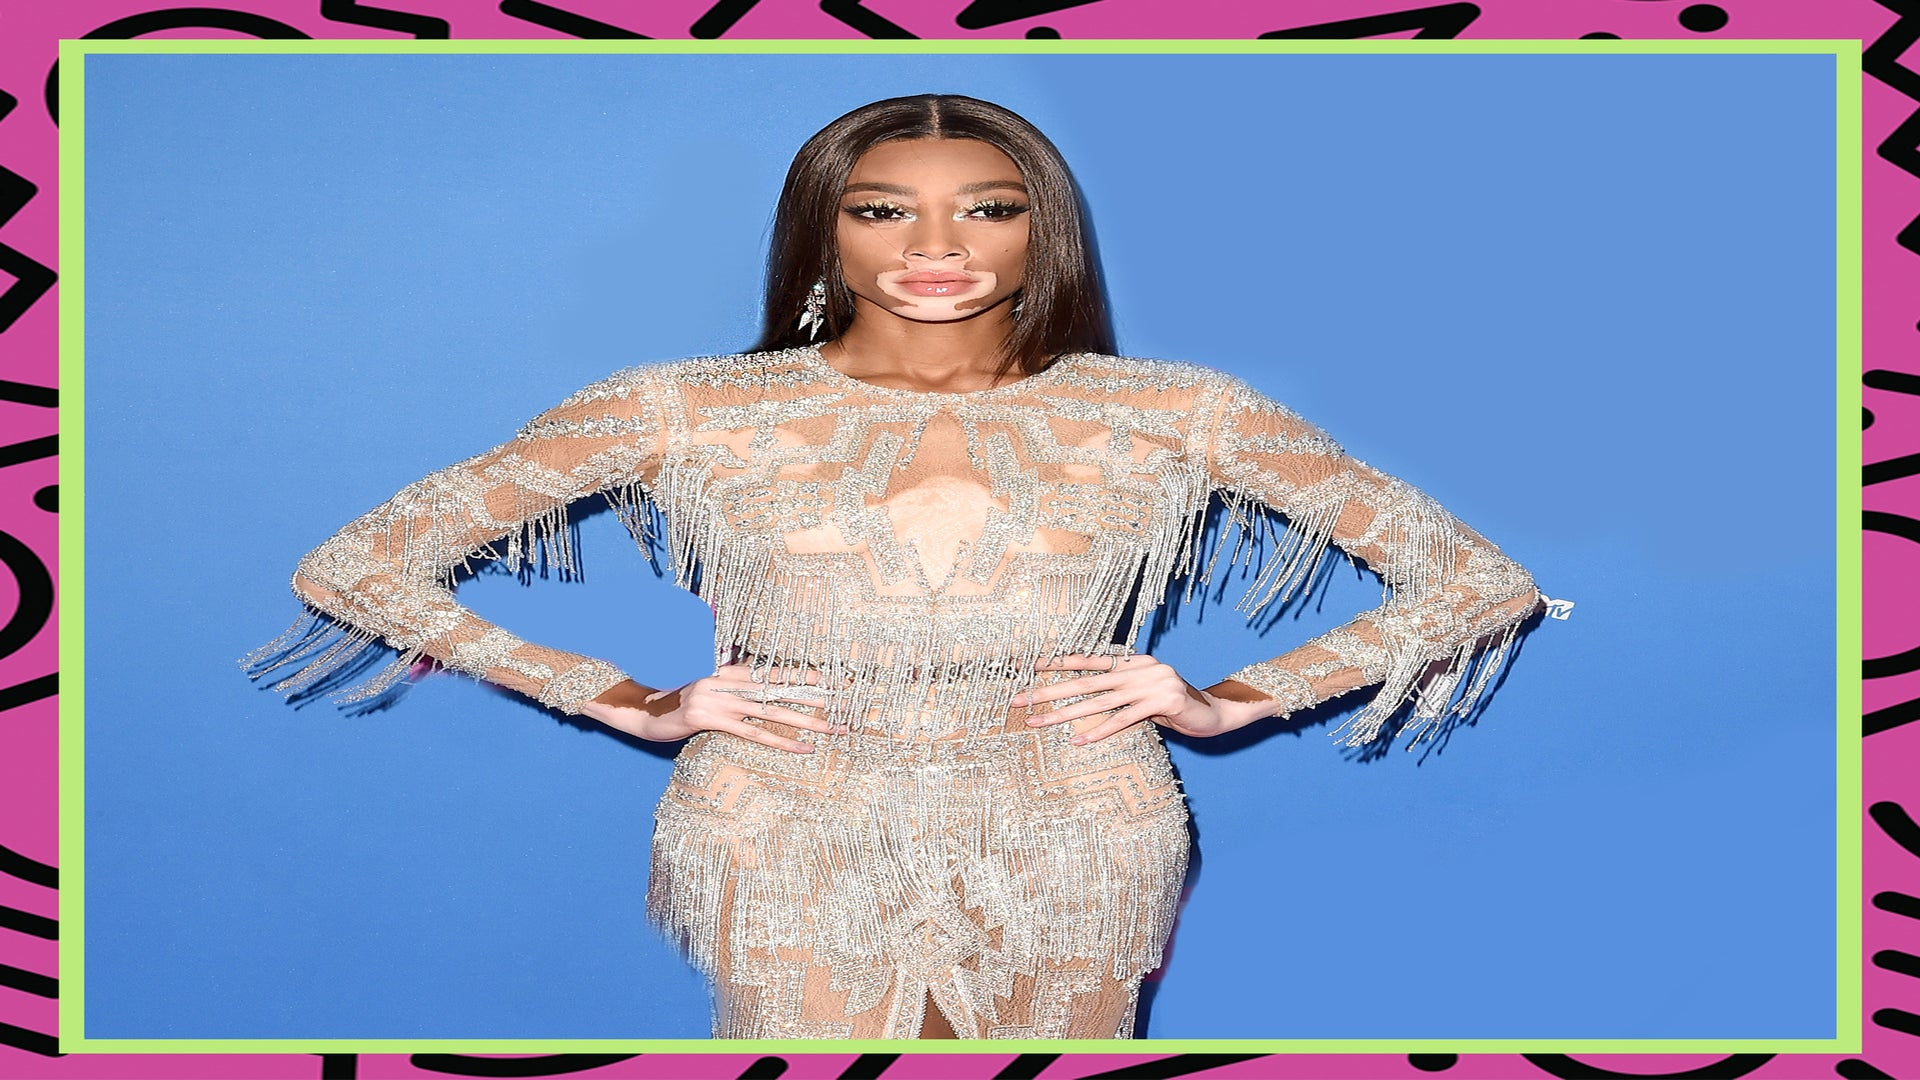 Winnie Harlow's Fashion Sense Is A Triple Threat On The VMA's Red Carpet